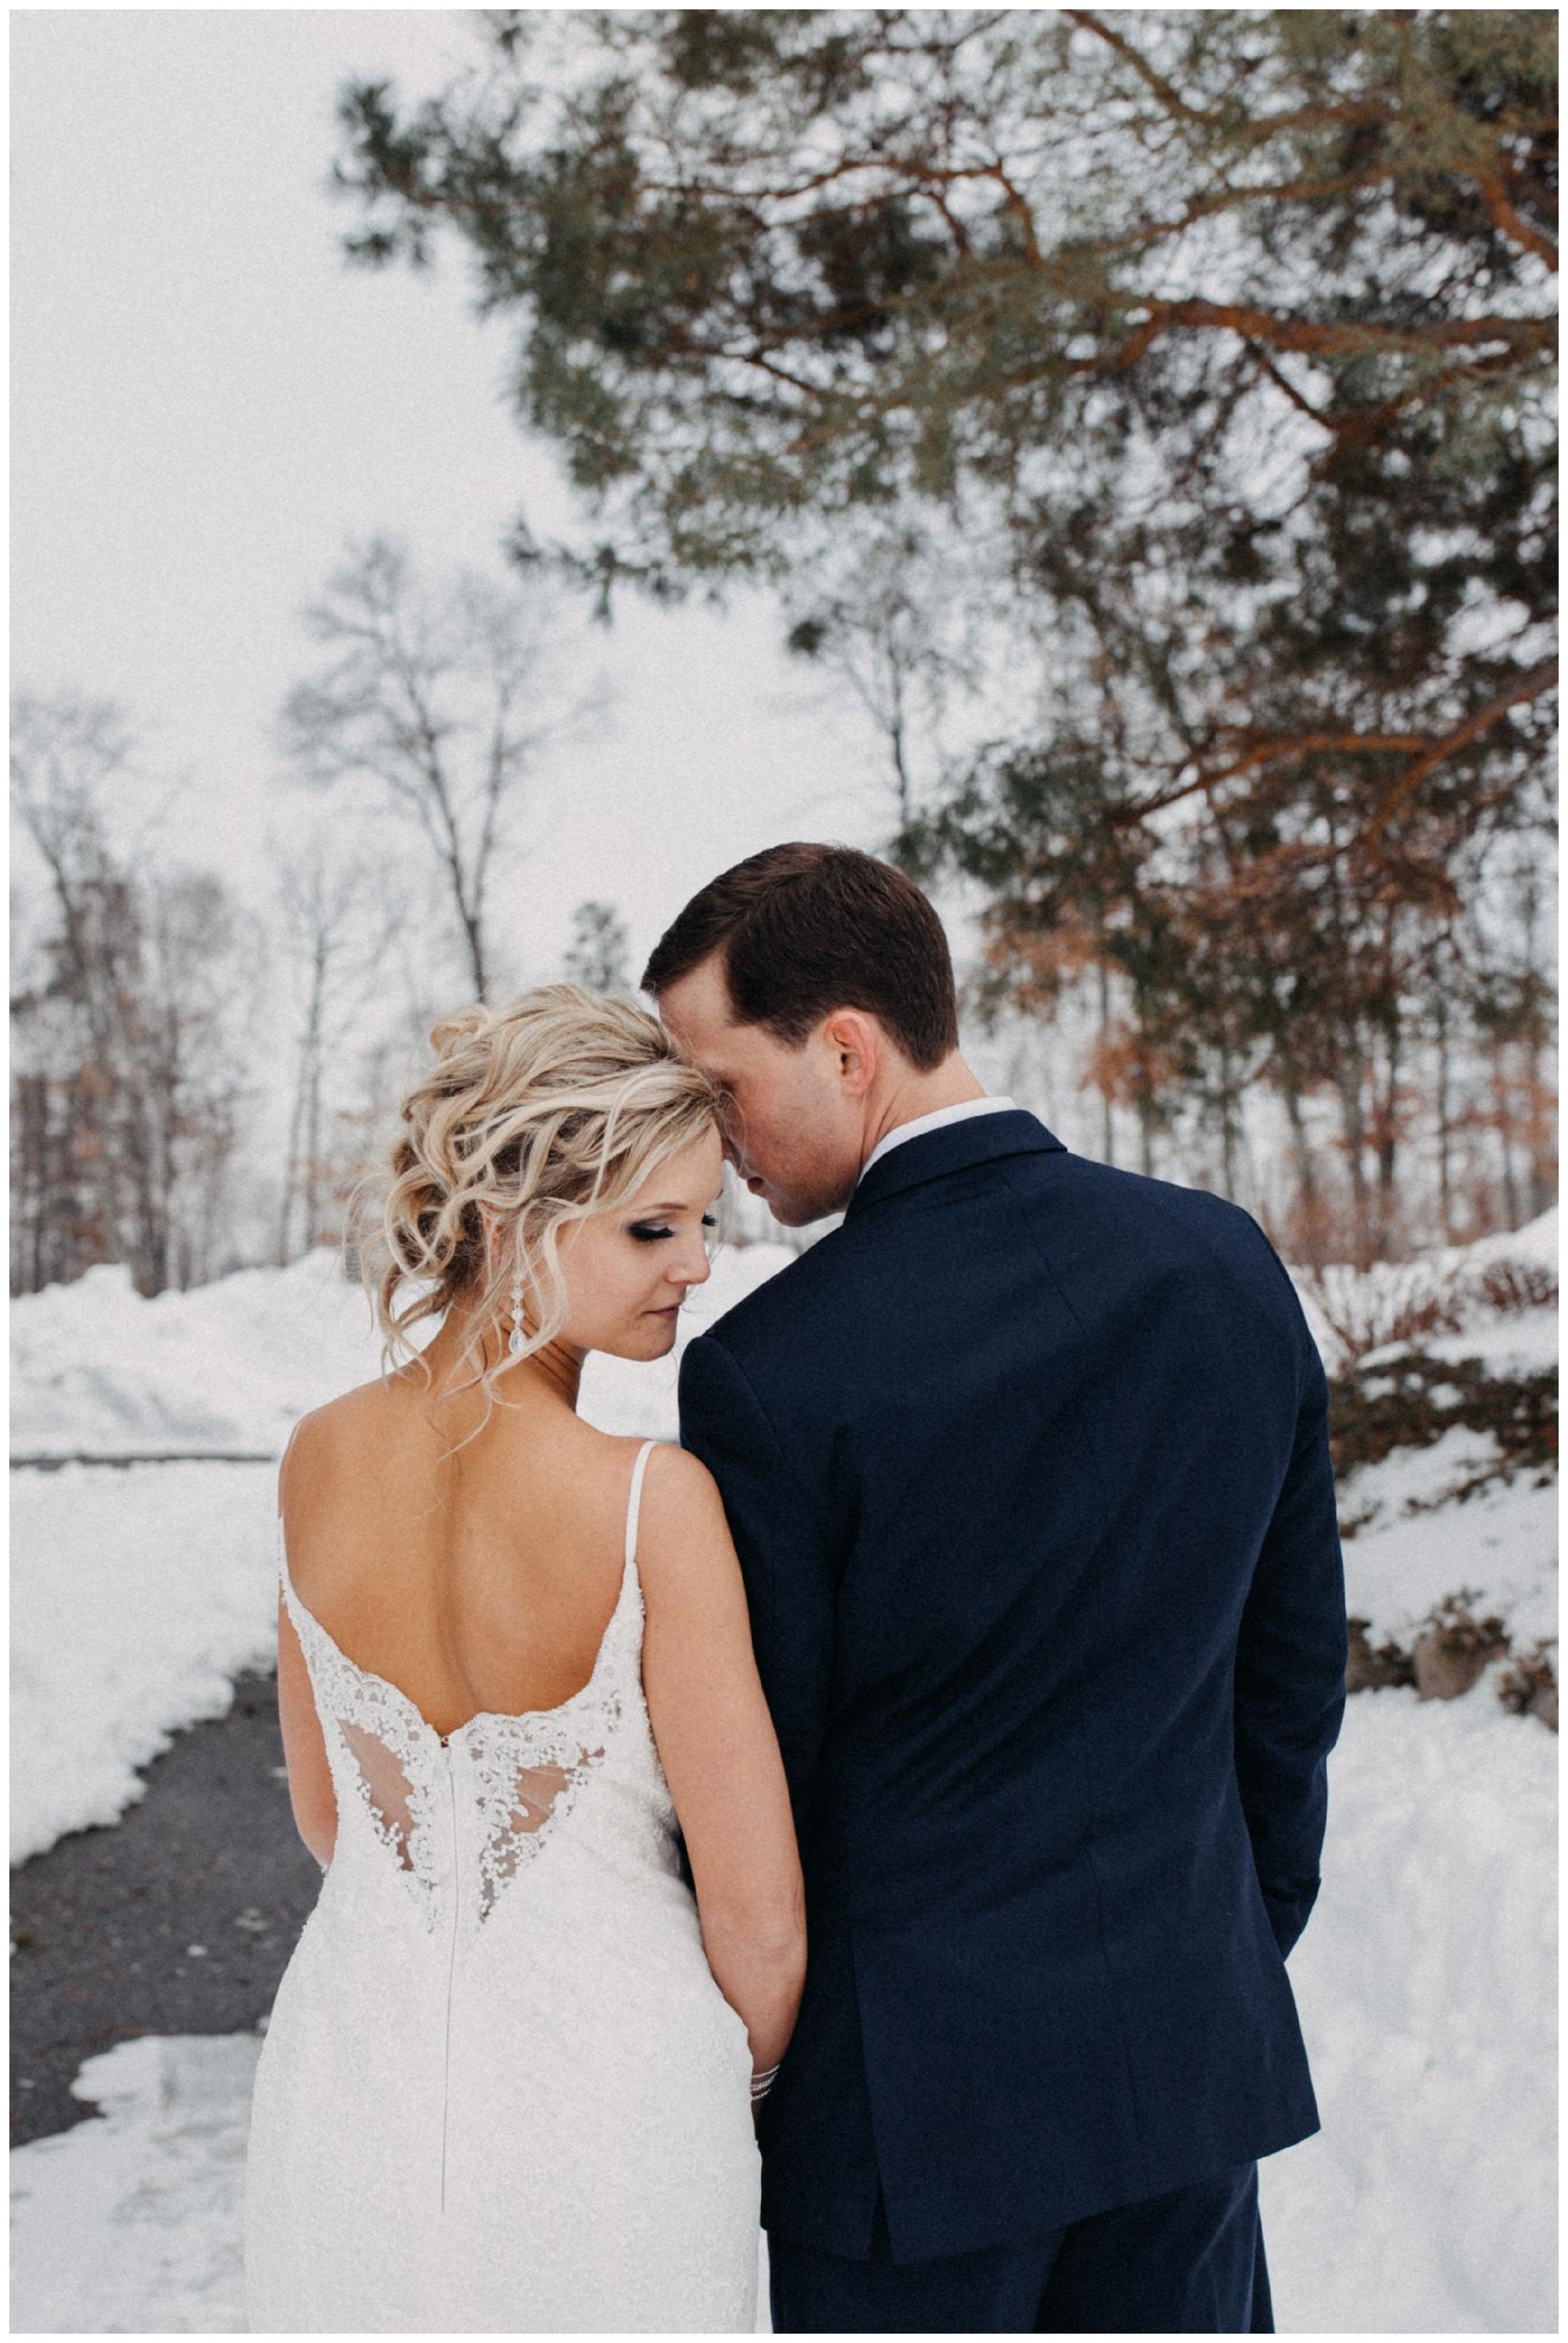 Winter wedding at Cragun's resort in Brainerd Minnesota